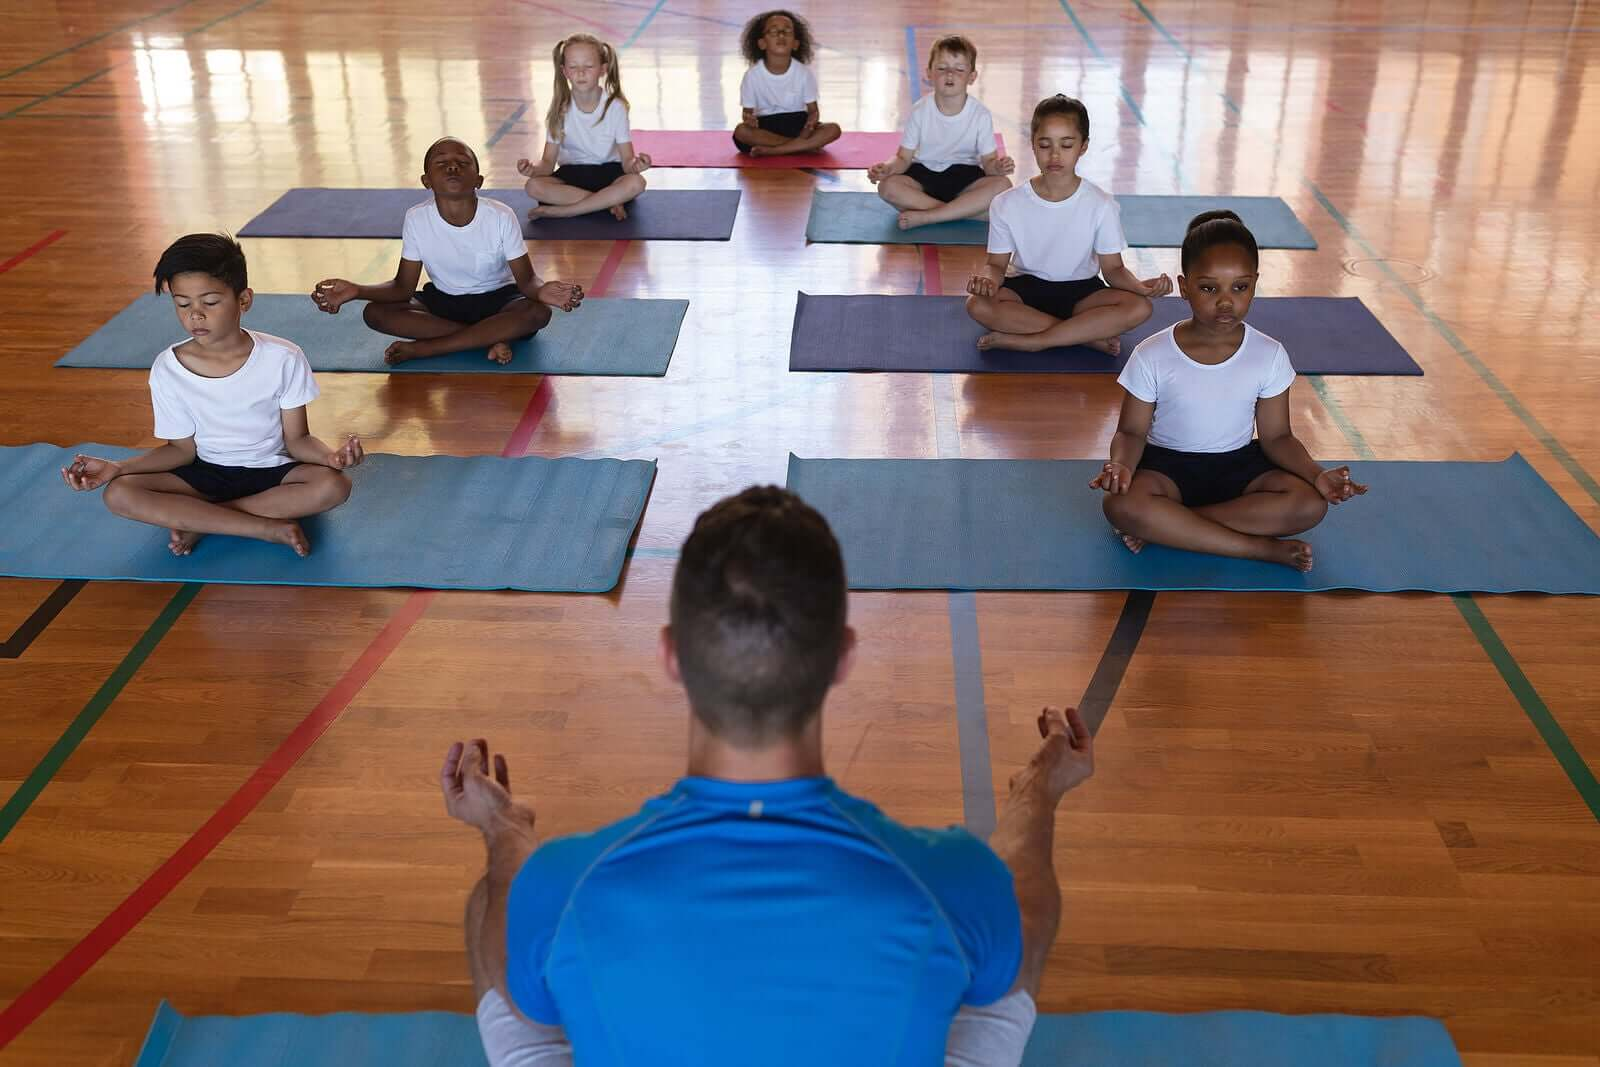 Children practicing yoga in a school gym.